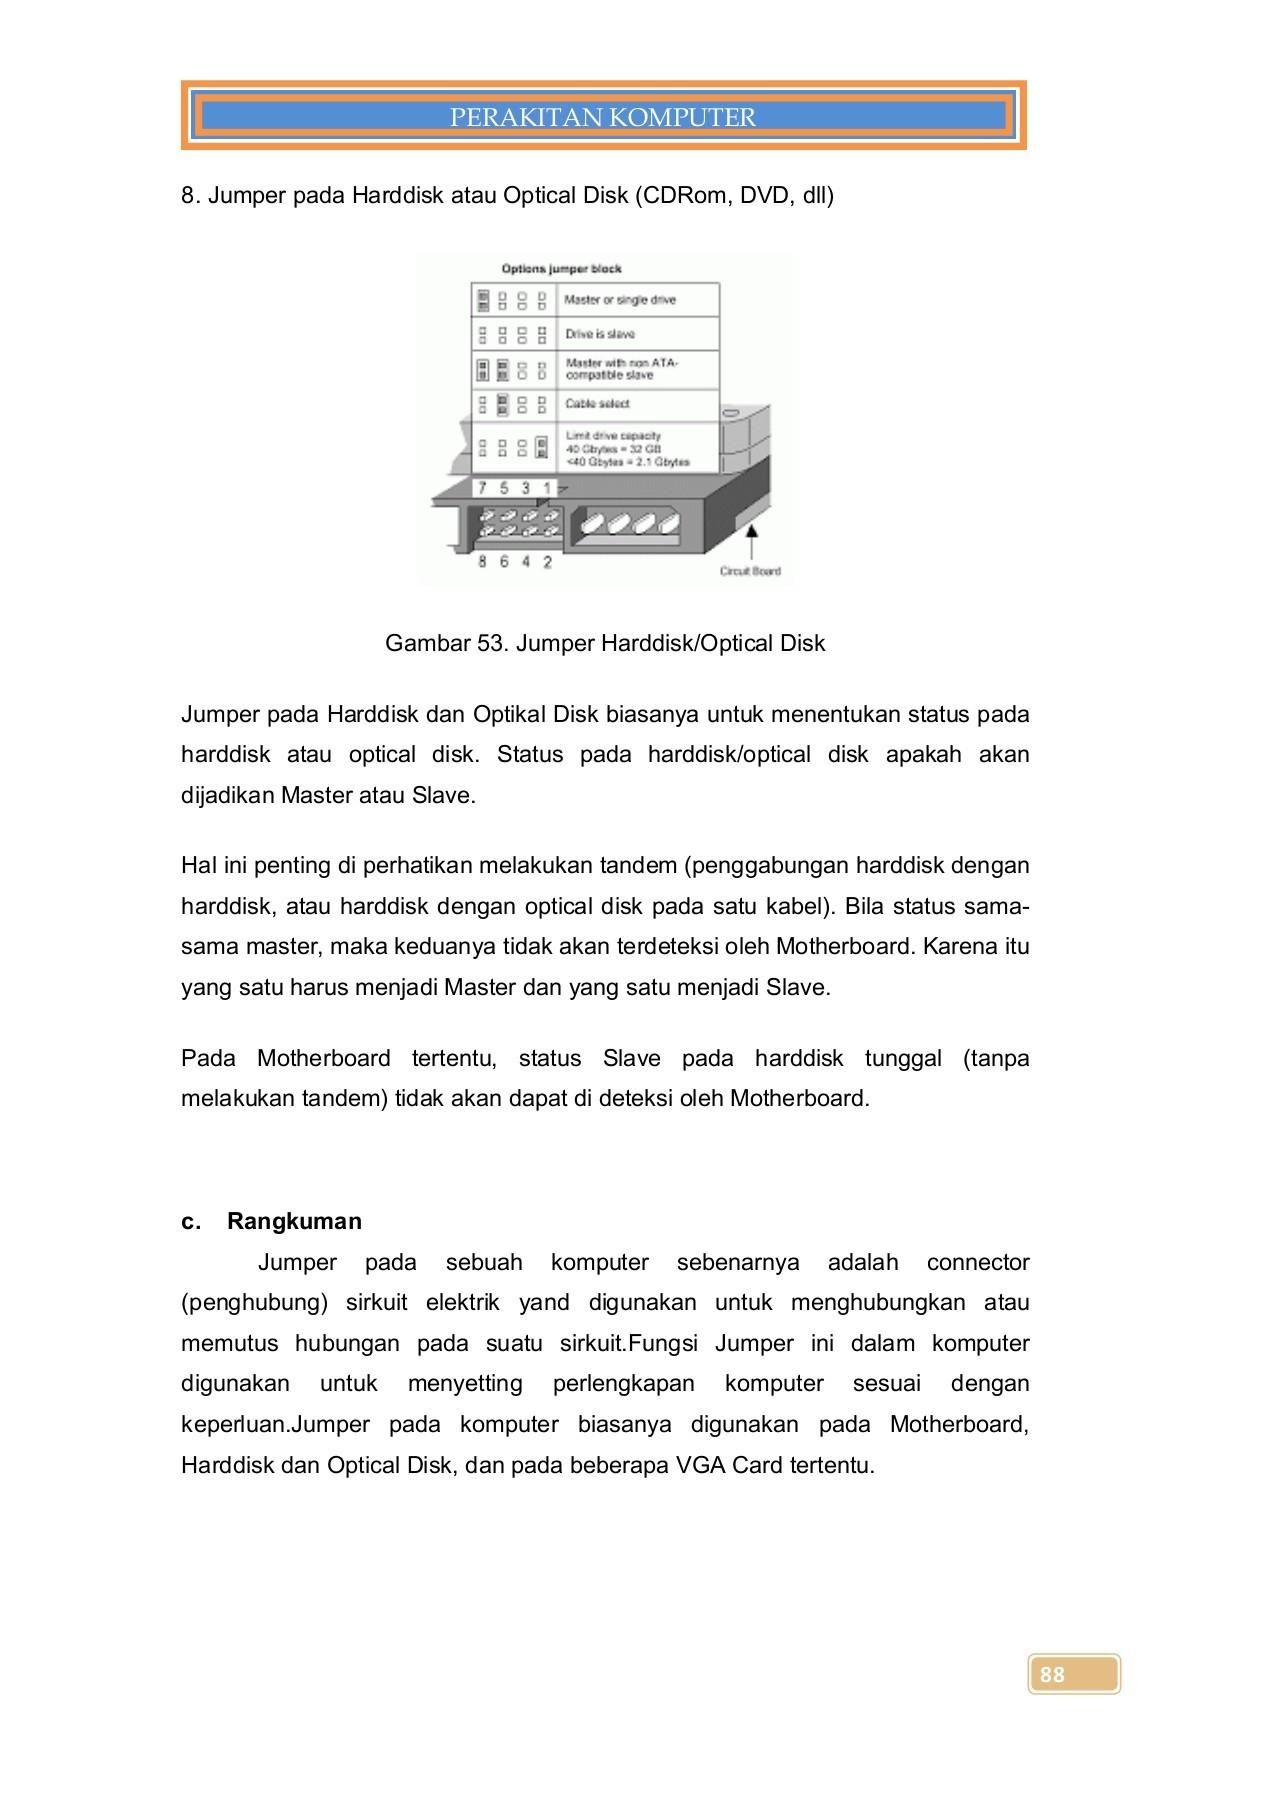 Fungsi Jumper Pada Motherboard : fungsi, jumper, motherboard, 1-C2-Perakitan, Komputer-X-1, Pages, 101-150, PubHTML5